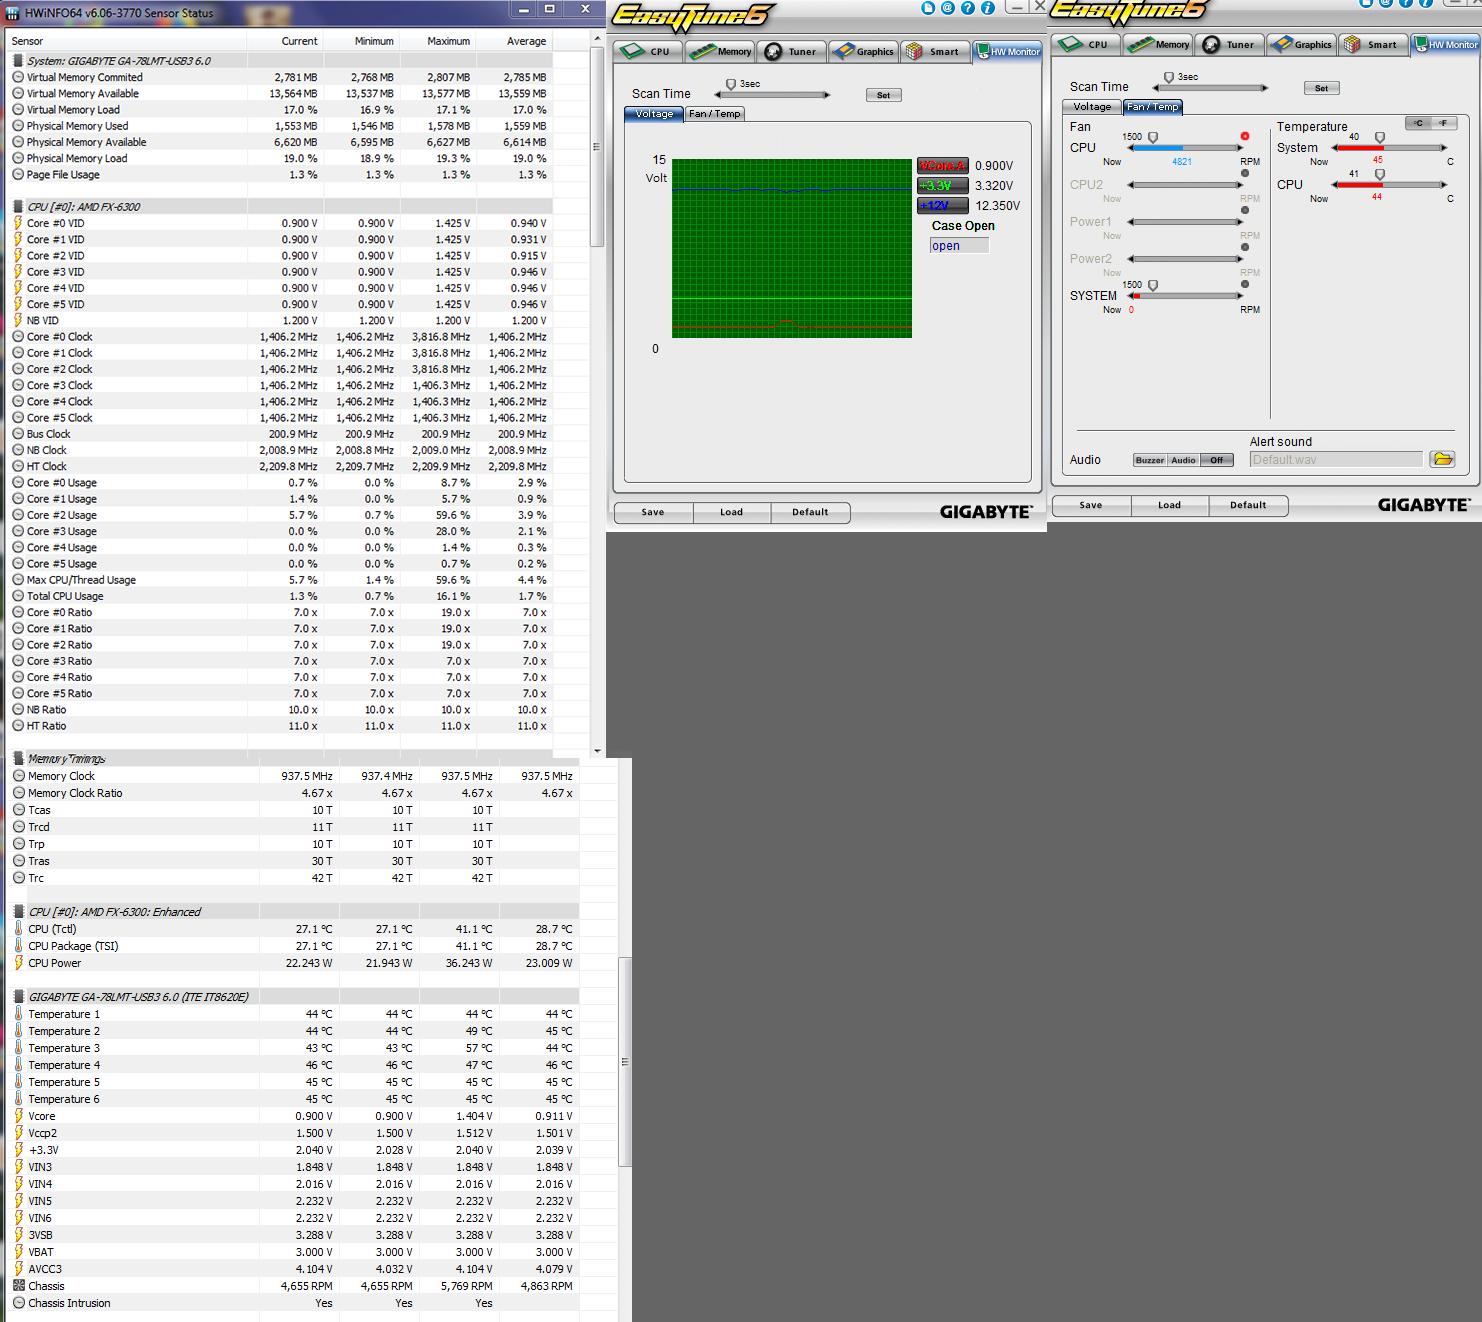 Screenshot-56.png